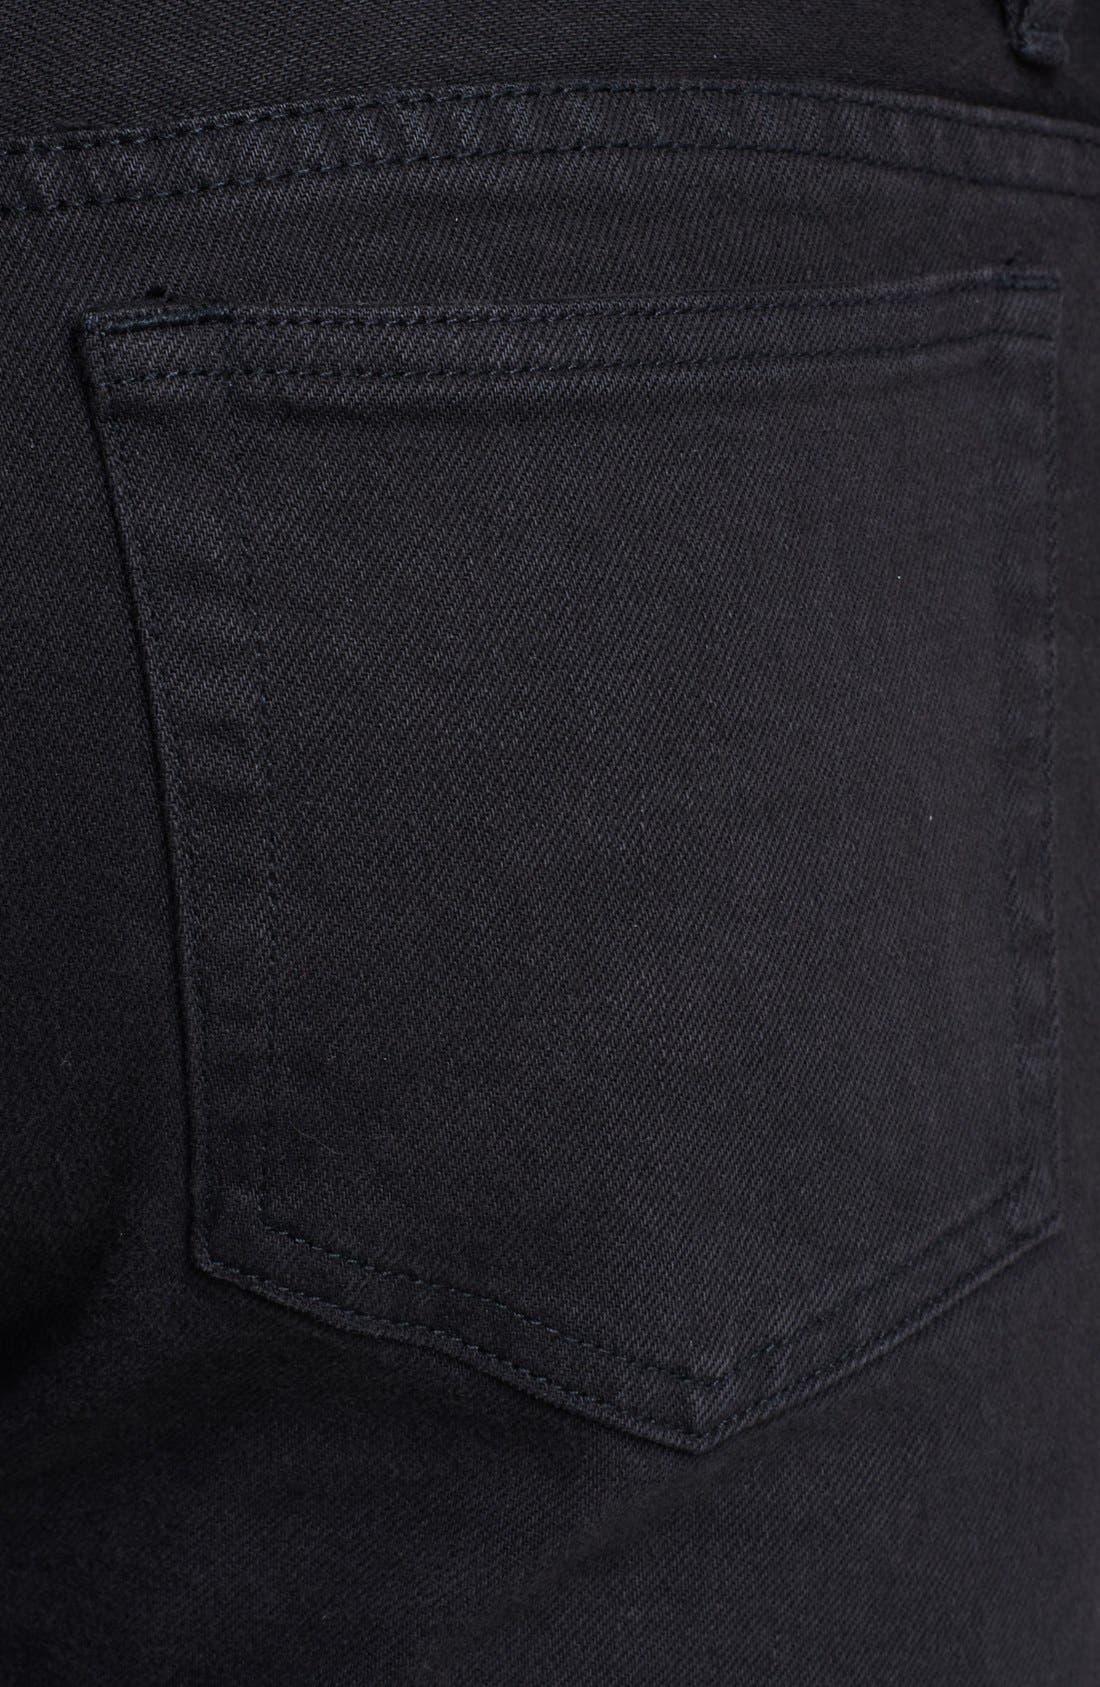 Alternate Image 4  - A.P.C. 'Petit Standard' Skinny Fit Jeans (Black)